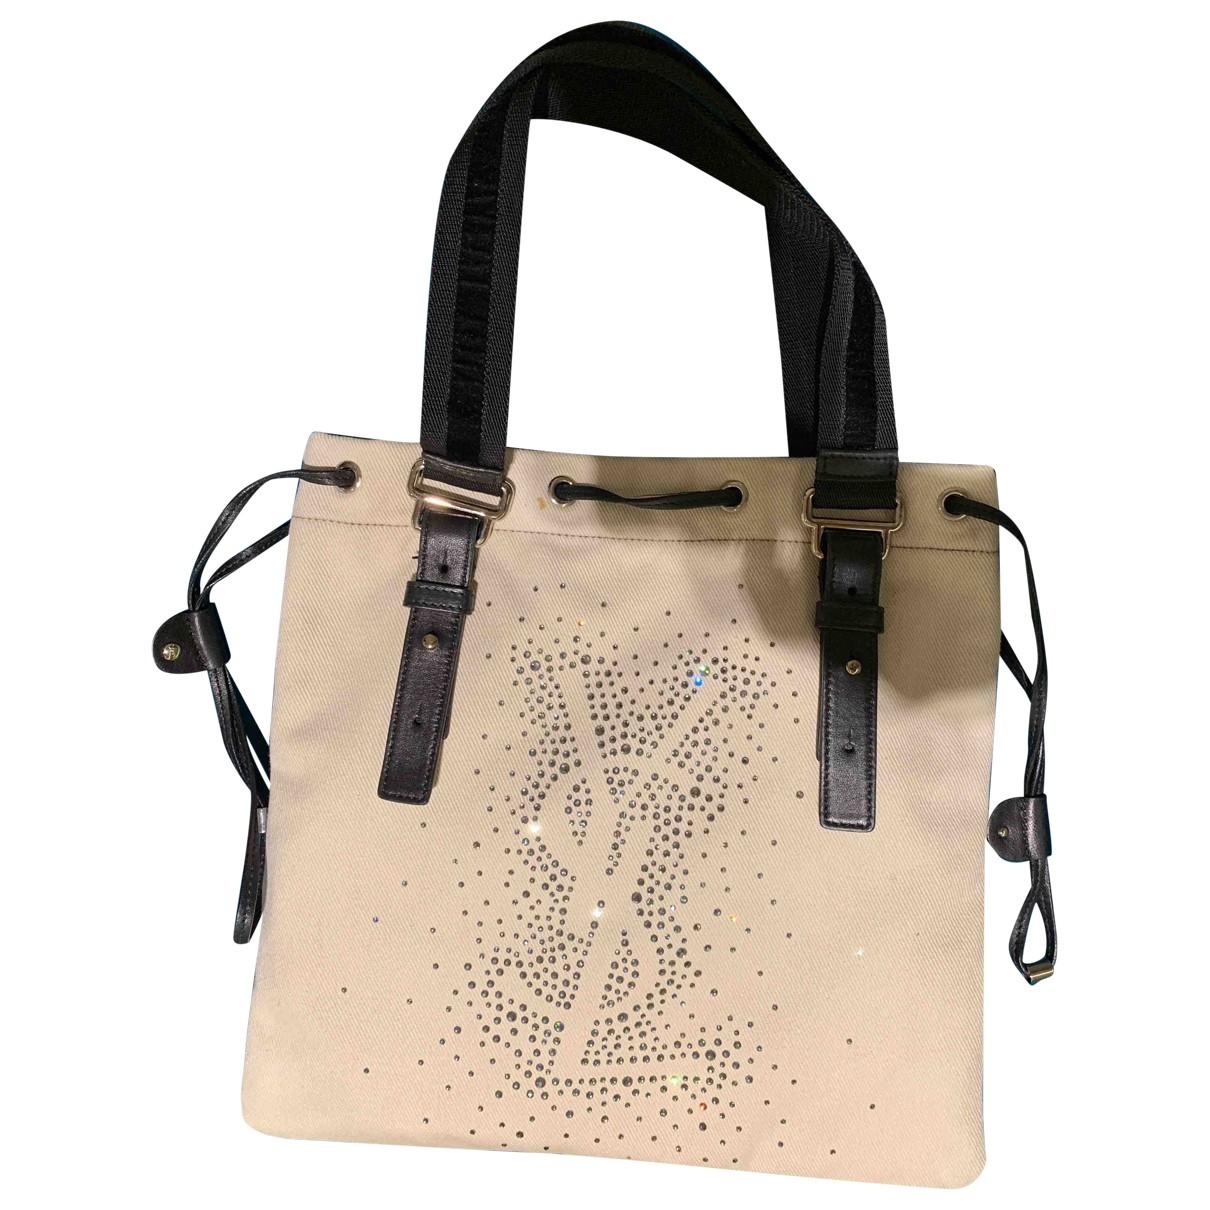 Yves Saint Laurent \N Beige Cloth handbag for Women \N